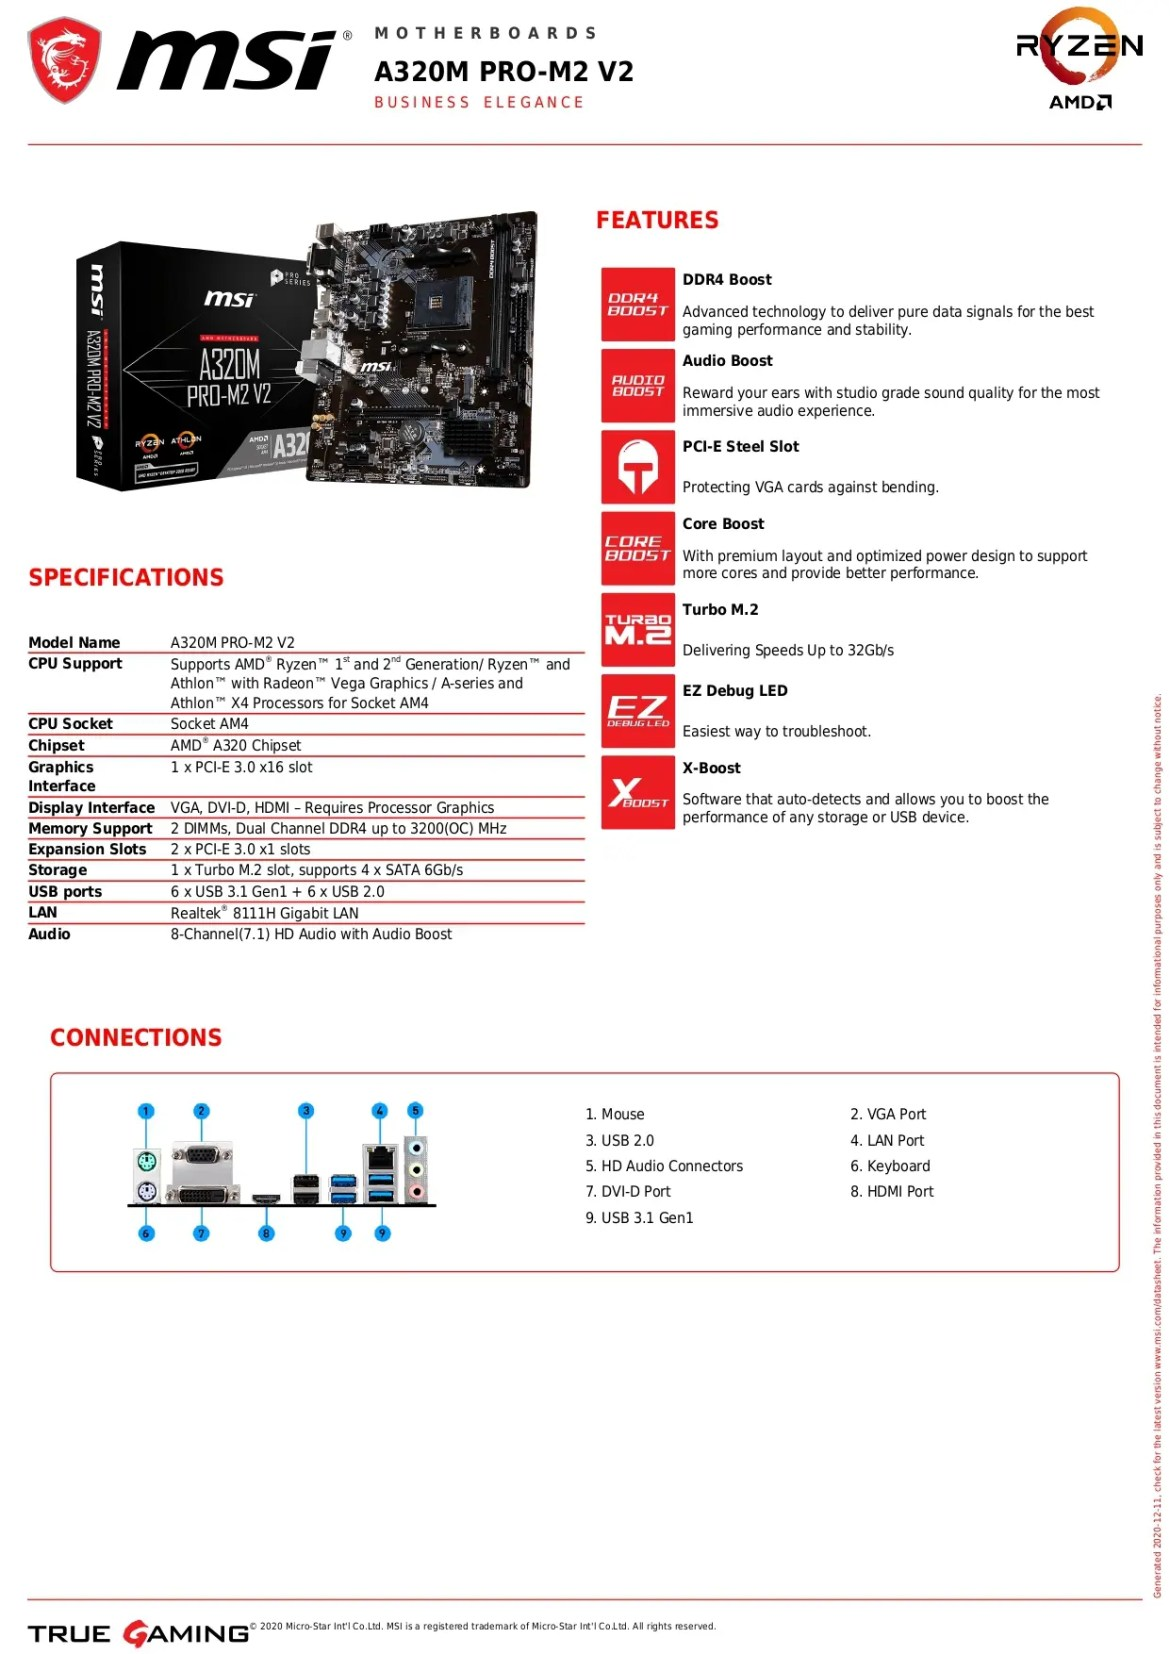 MSI A320M PRO-M2 V2 Motherboard